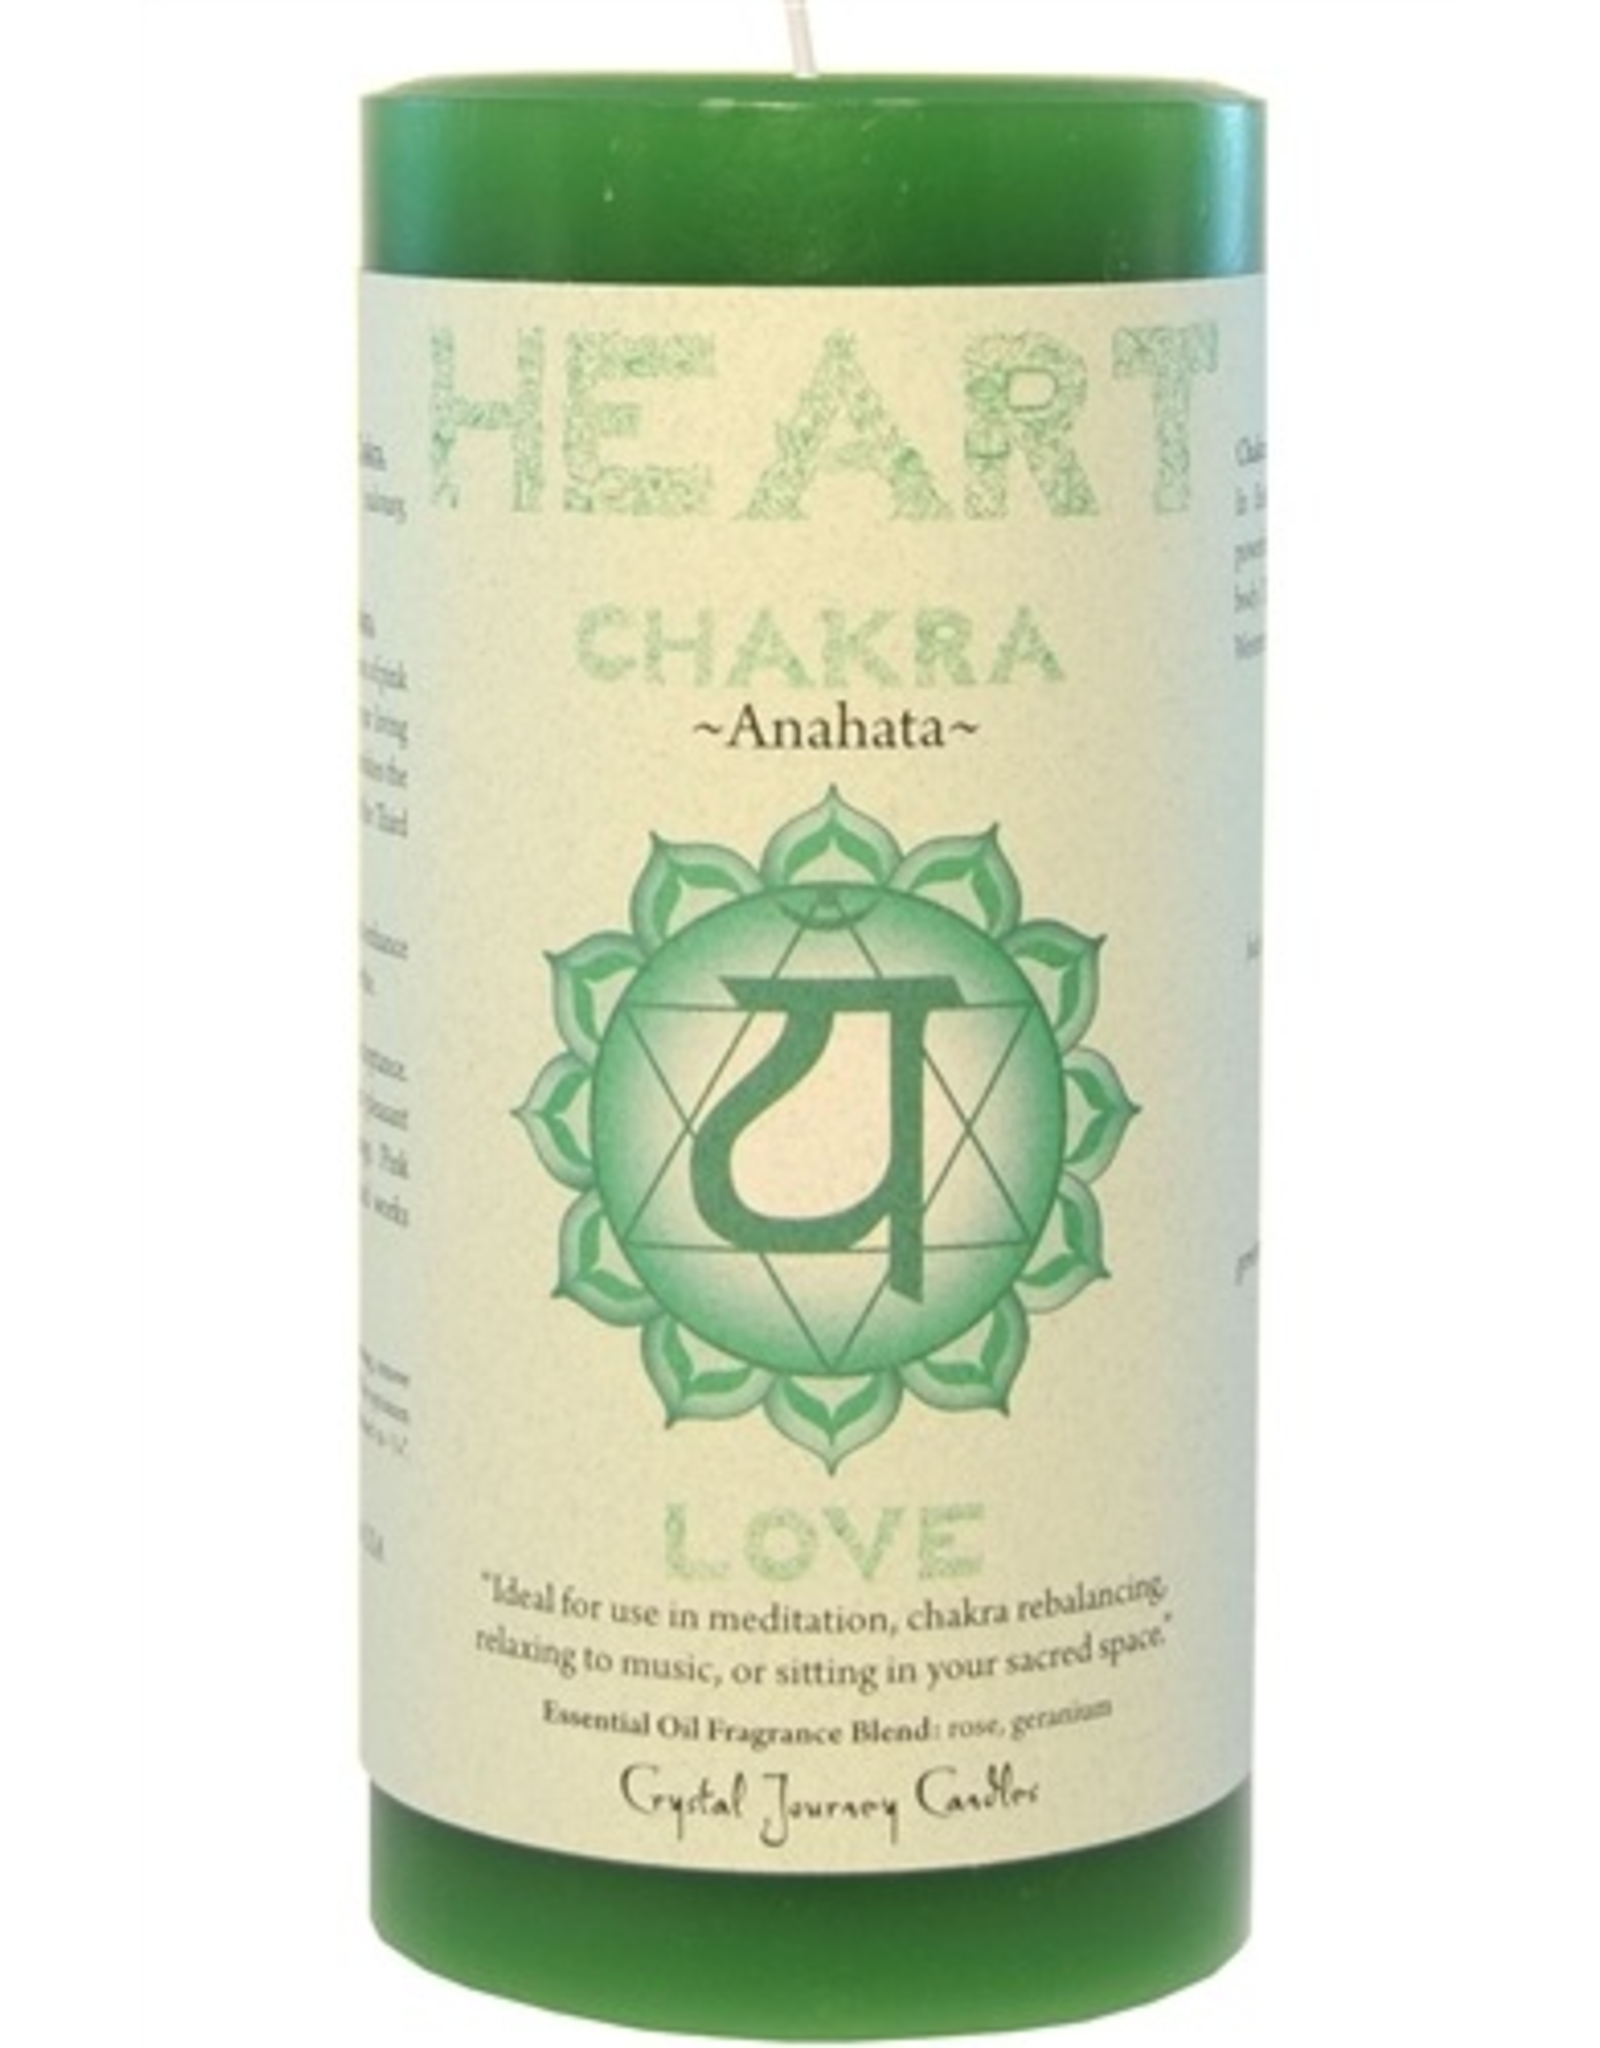 Crystal Journey Chakra Pillar 3x6 Candle-Heart